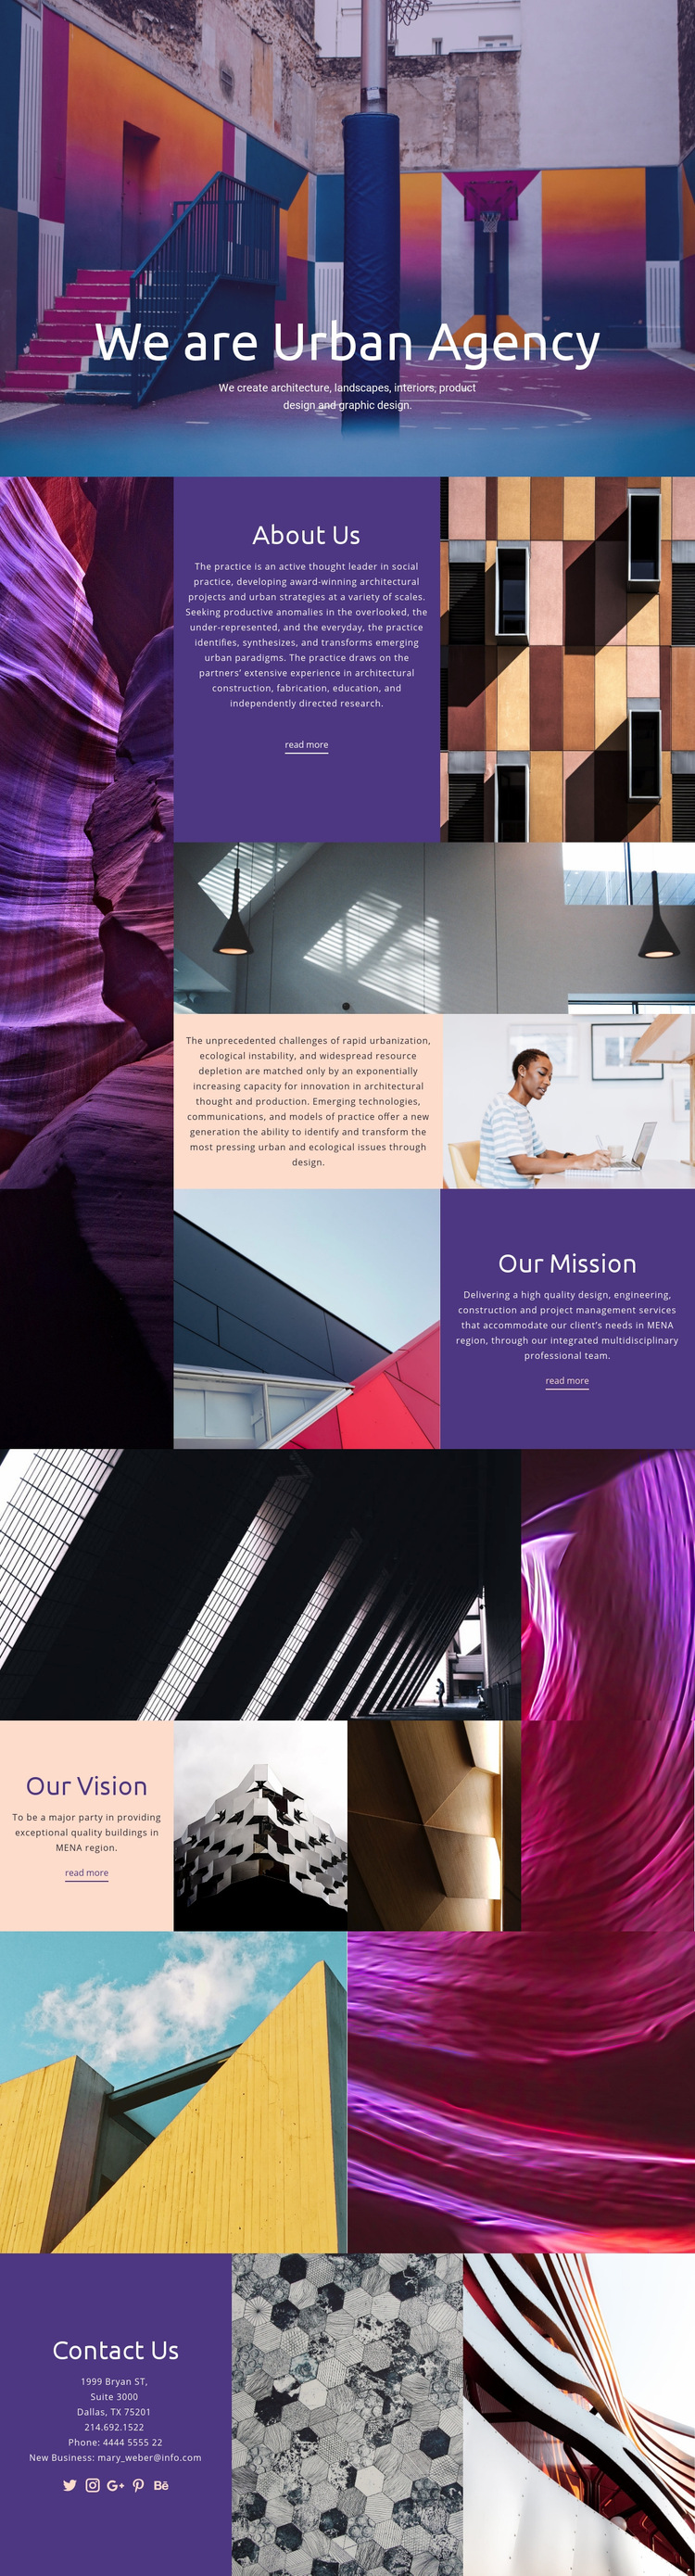 Urban real estate Web Page Design